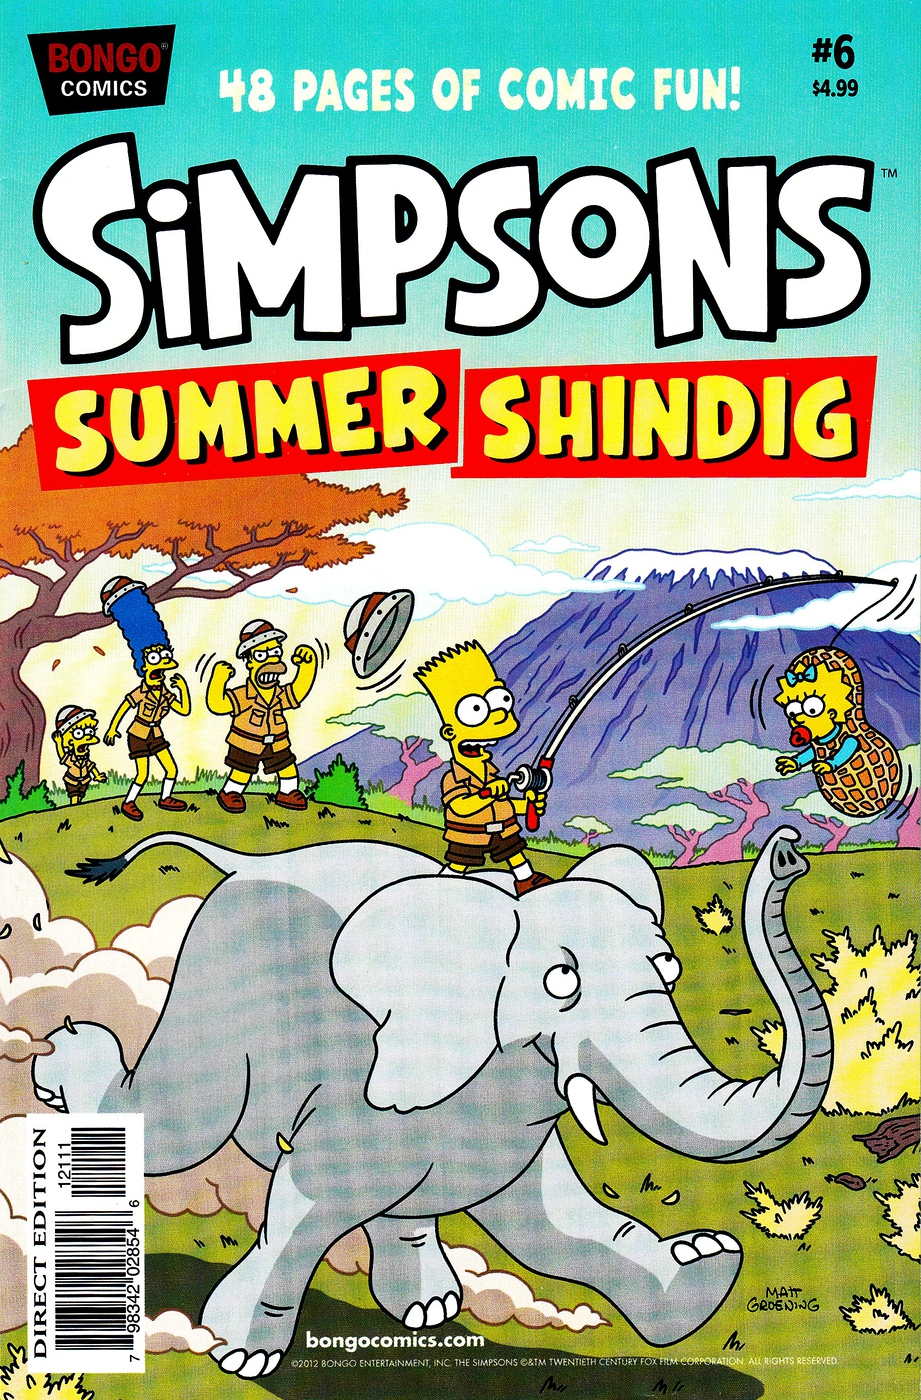 Simpsons Summer Shindig #06